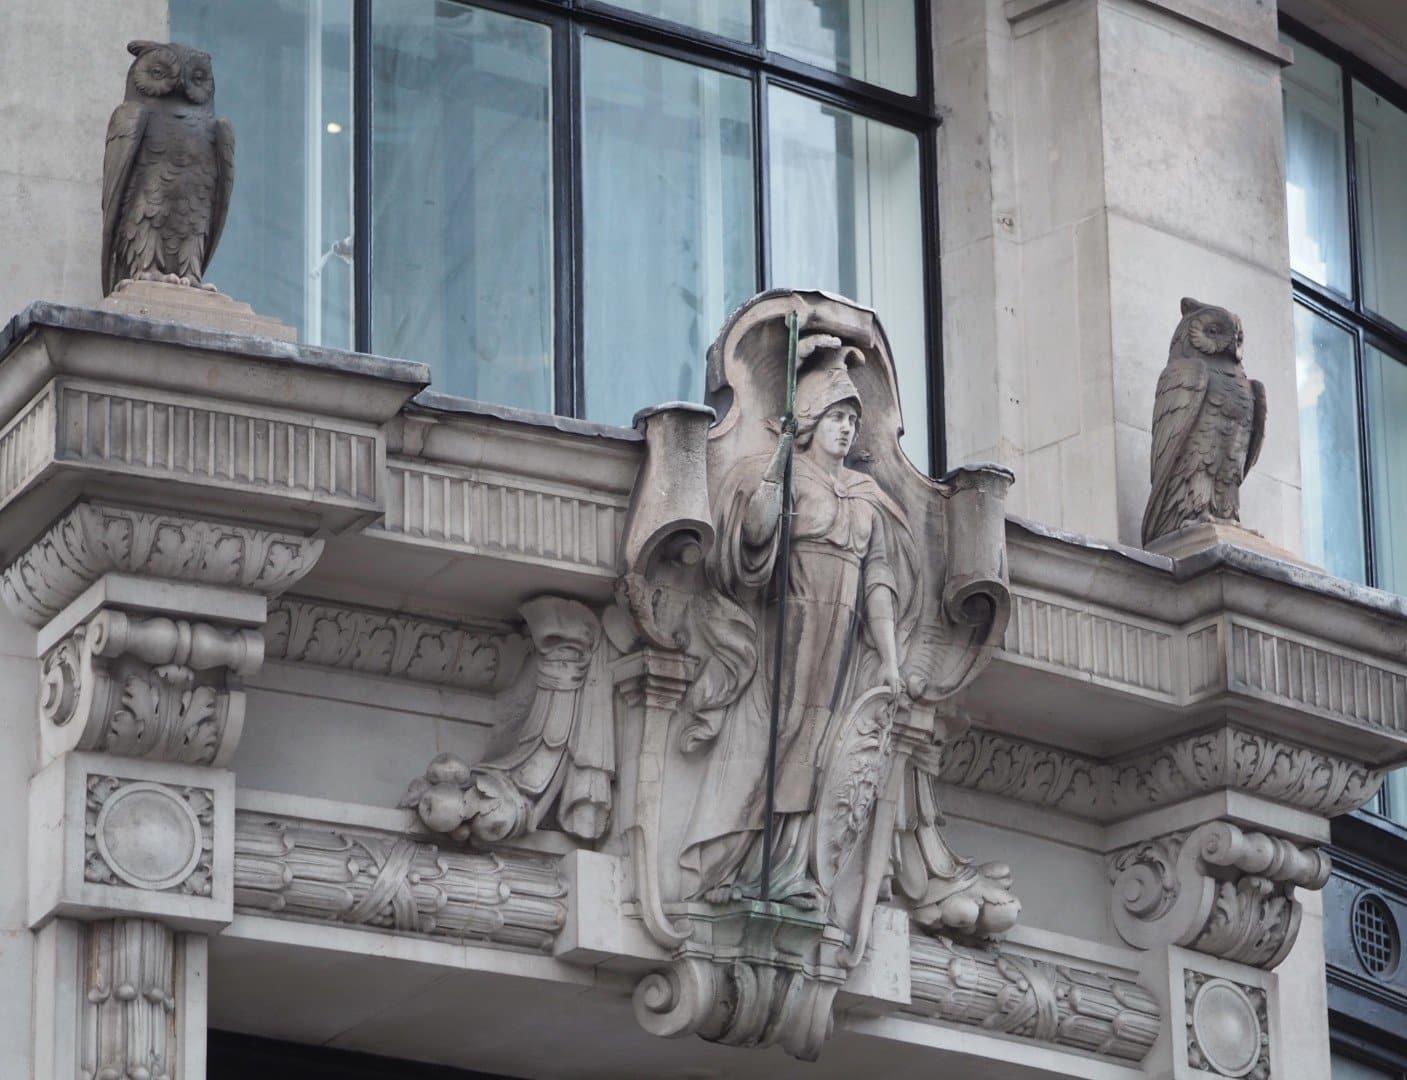 City of London Animals - Owls